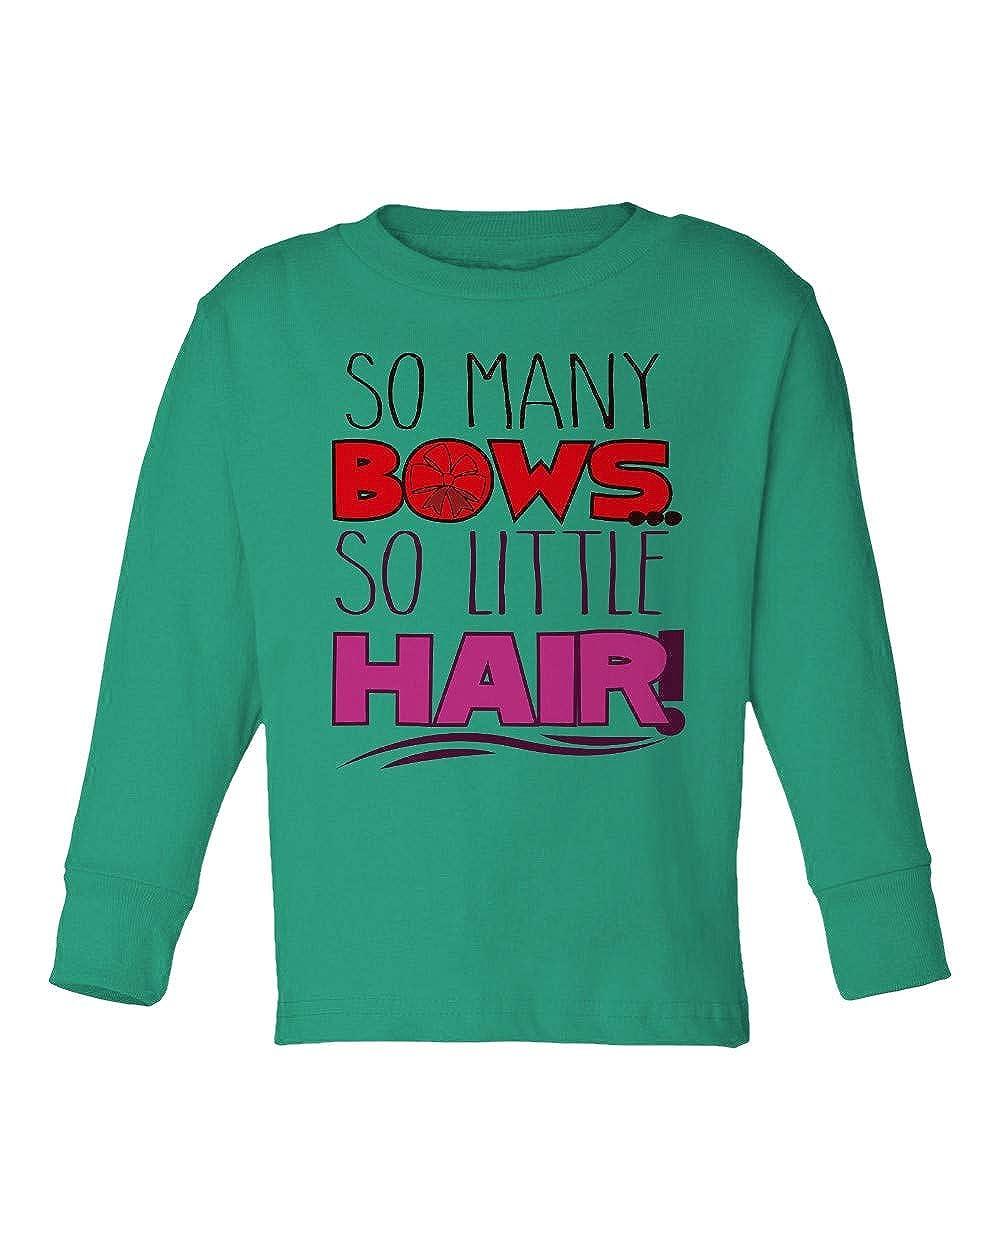 Societee So Many Bows So Little Hair Funny Hairless Girls Boys Toddler Long Sleeve T-Shirt